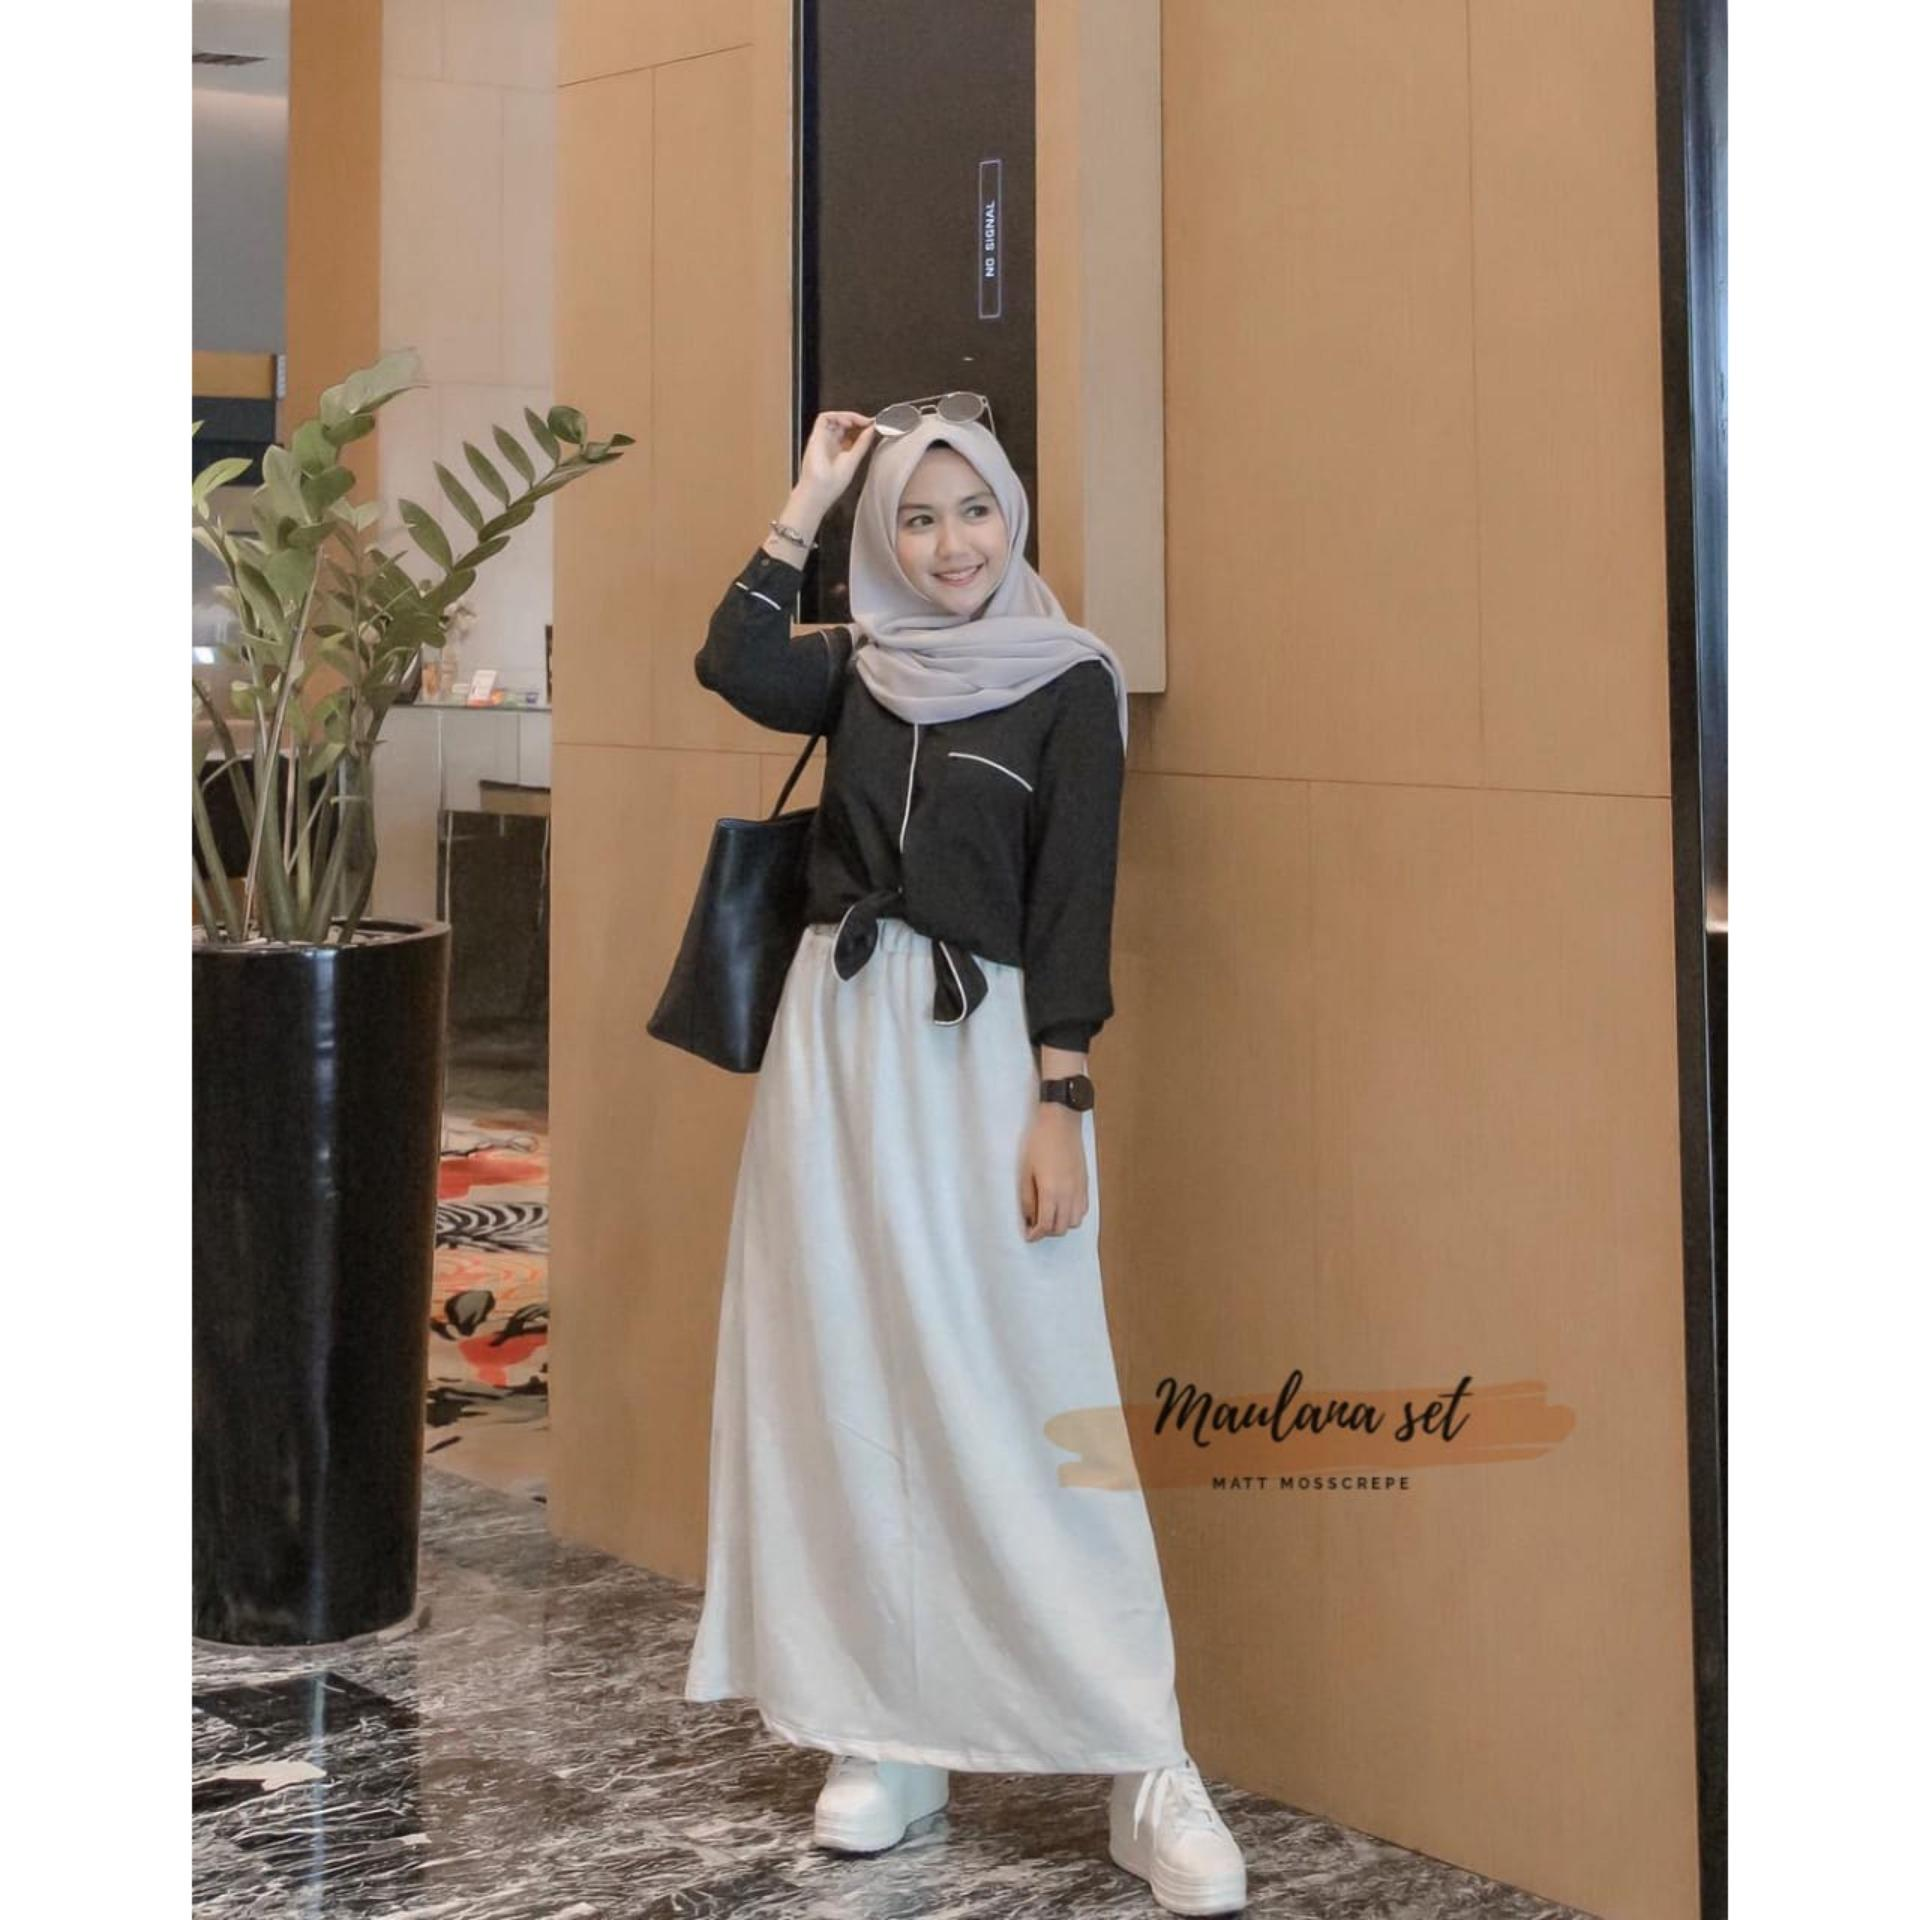 Baju Muslim Modern Setelan Maulana Set Mosscrepe Baju Atasan Casual Baju +  Rok Modern Wanita Setelan c8bfcc3777